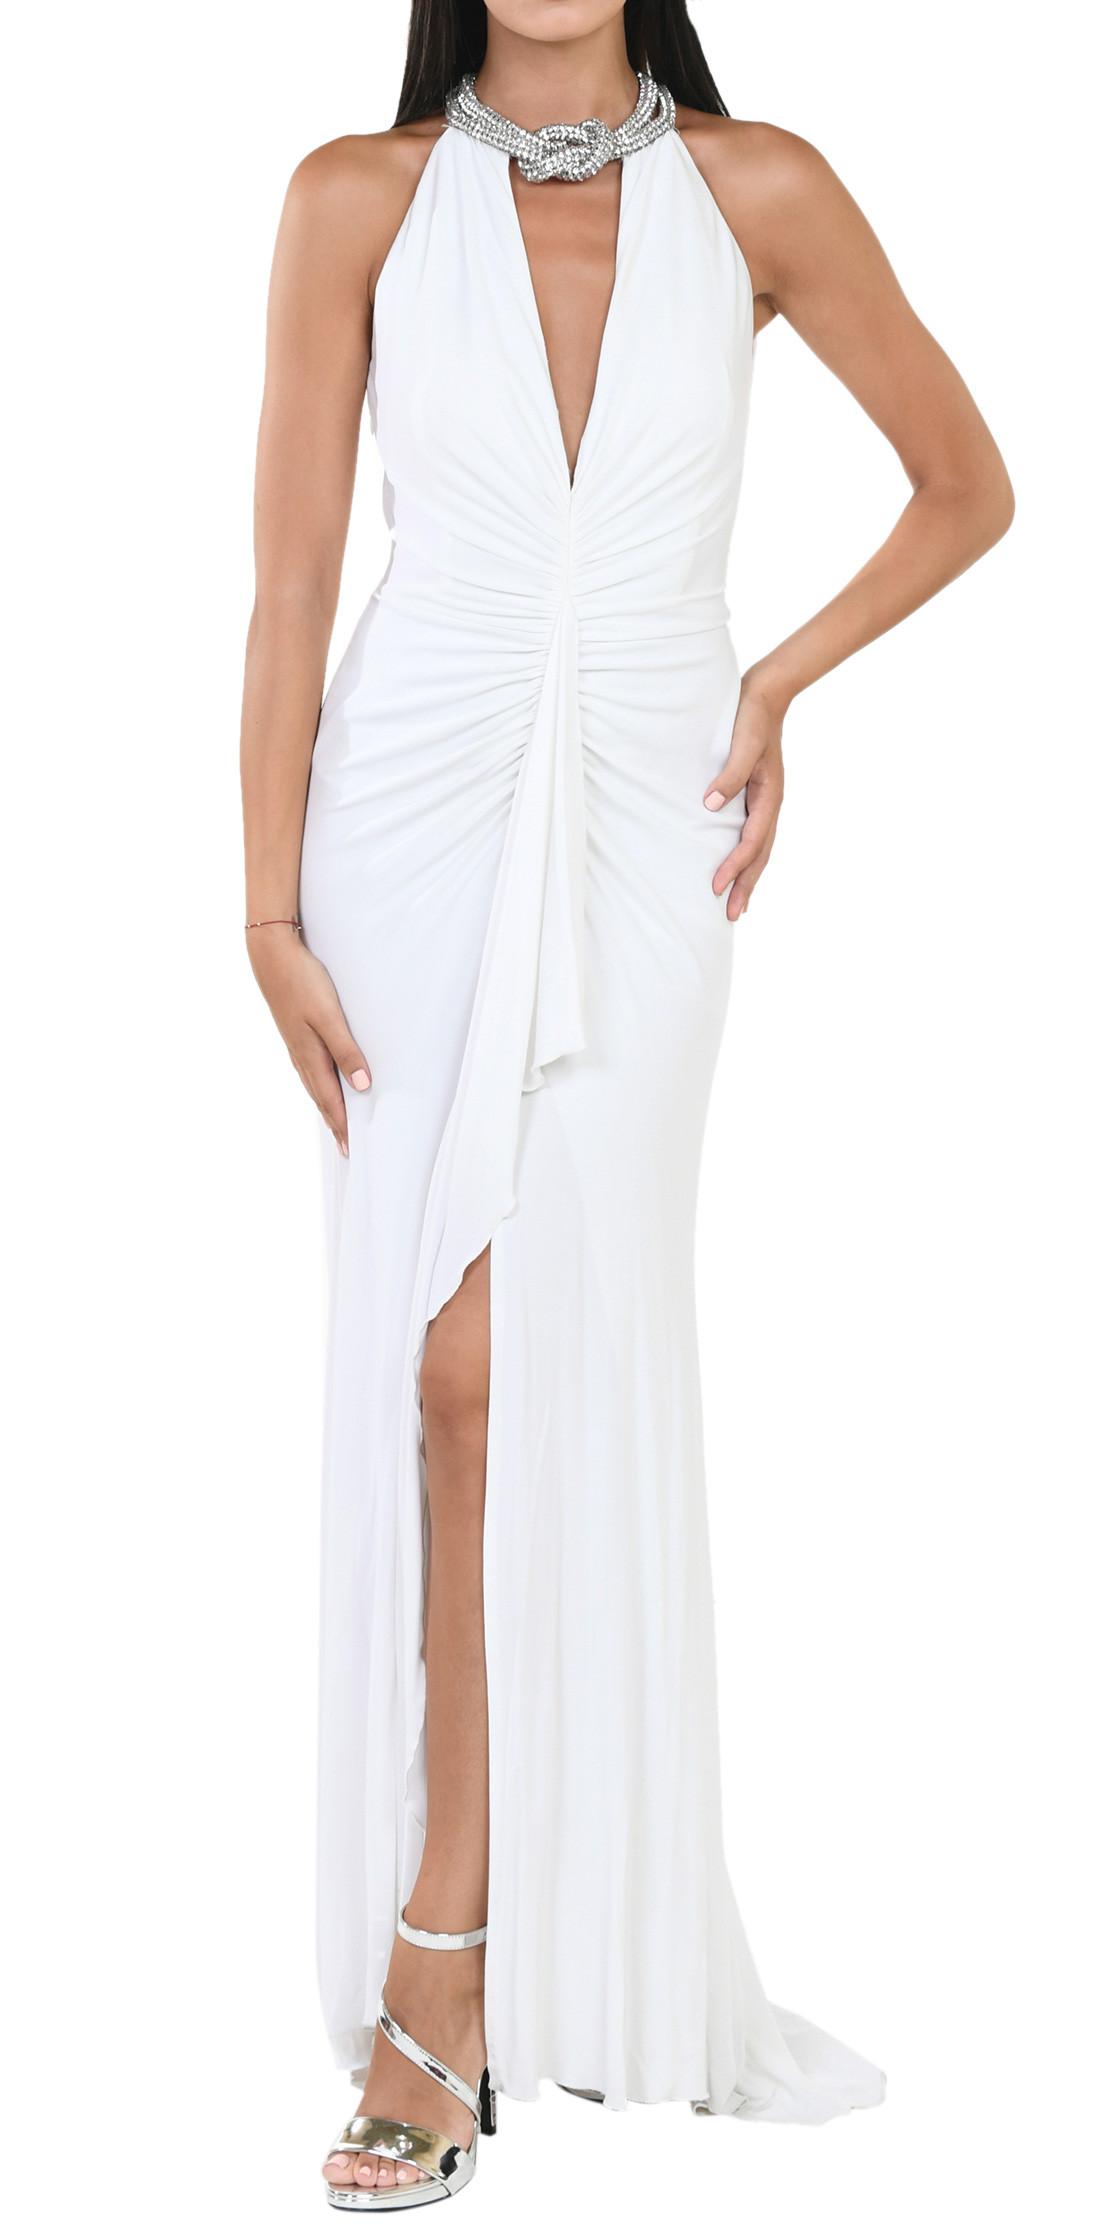 Nicole Bakti V-Neck Chocker Gown  afc0ab700